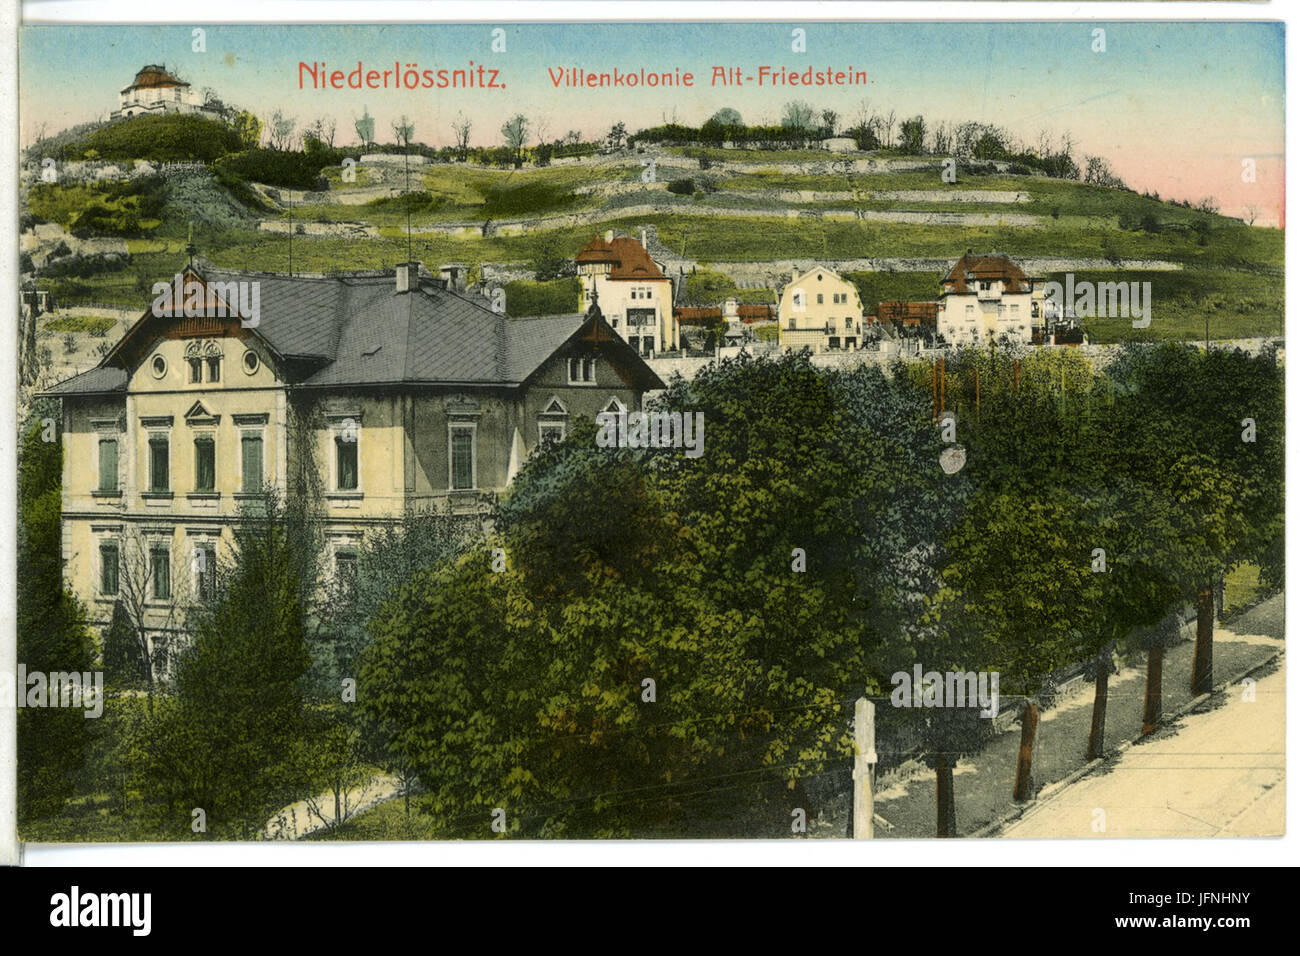 08795-Kötzschenbroda-1907-Villenkolonie Altfriedstein-Brück & Sohn Kunstverlag Stock Photo